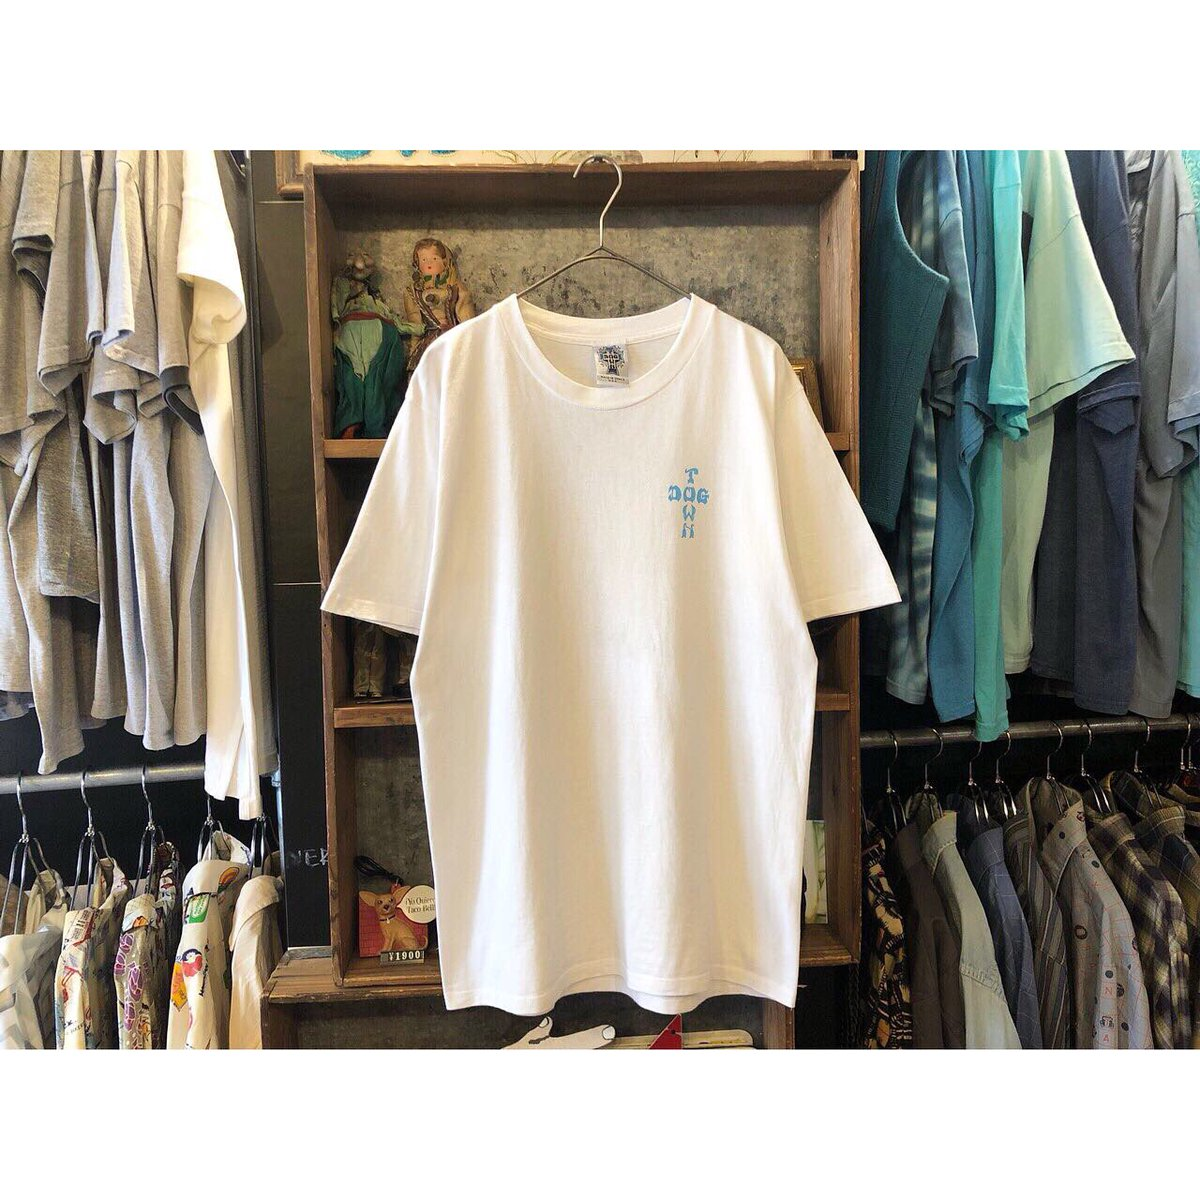 ". NER 2019.06.26 . . ""old DOG TOWN T-shirt . . size:M . ¥12800+tax . . made in VENICE USA . . #下北沢 #古着屋 #古着 #photography #filmcamera #digitalcamera #dogtown #ドッグタウン #skateboardpic.twitter.com/1jWxsl4WU5"